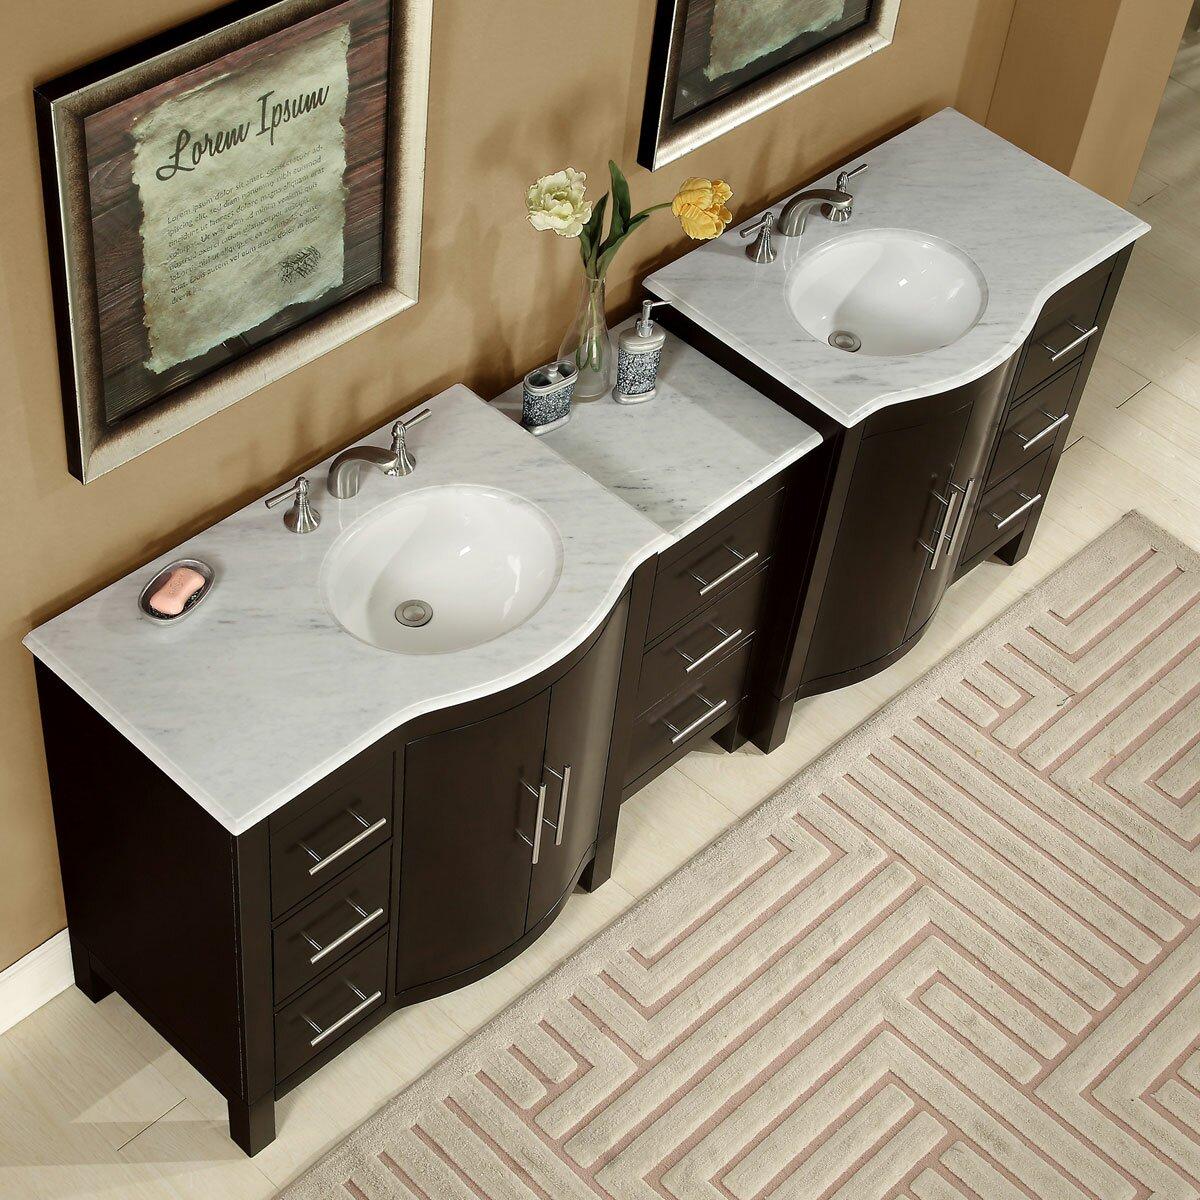 60 in double sink bathroom vanity